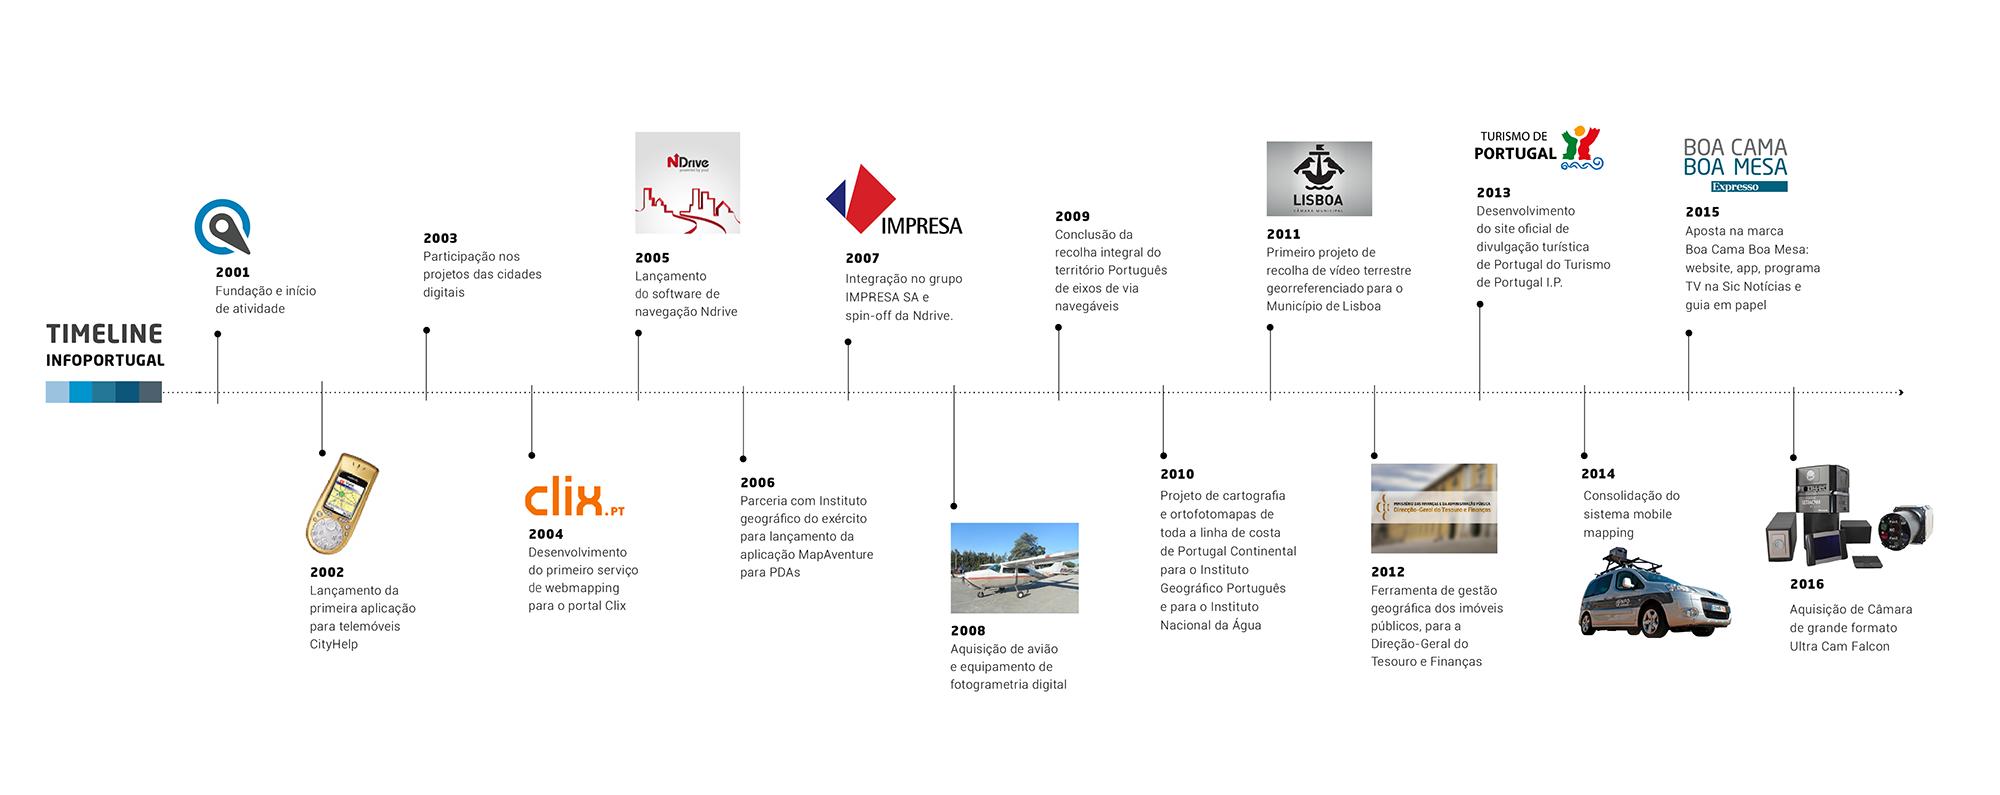 infoportugal-timeline